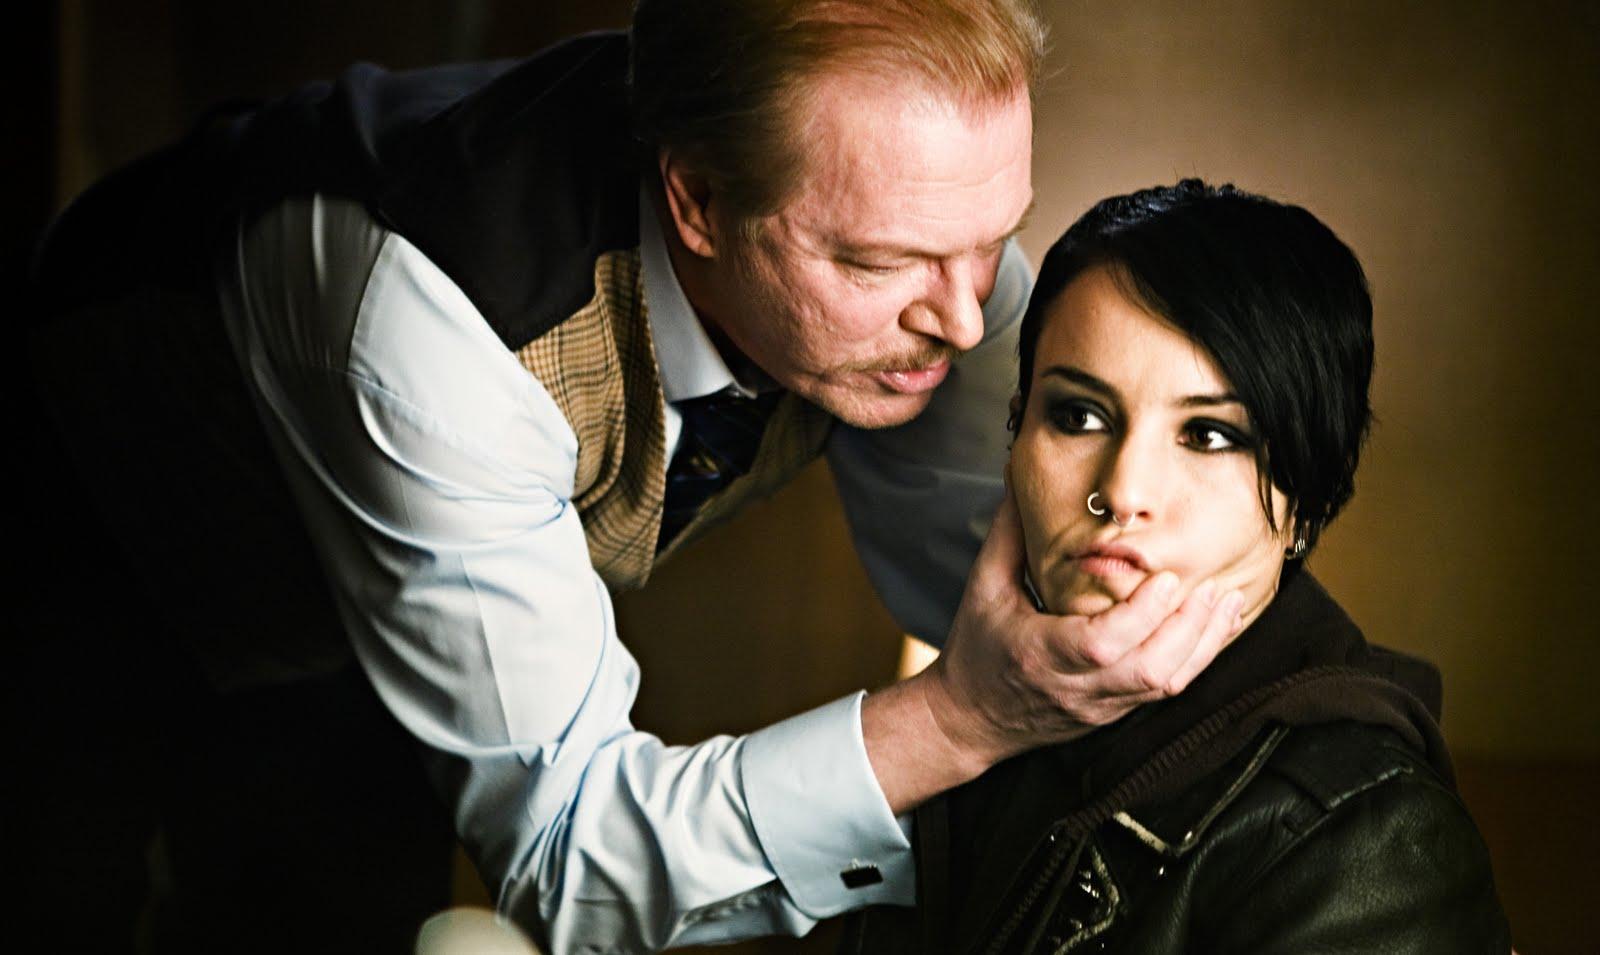 Coach paco bailac todo lo que atente contra la dignidad for Noomi rapace the girl with the dragon tattoo